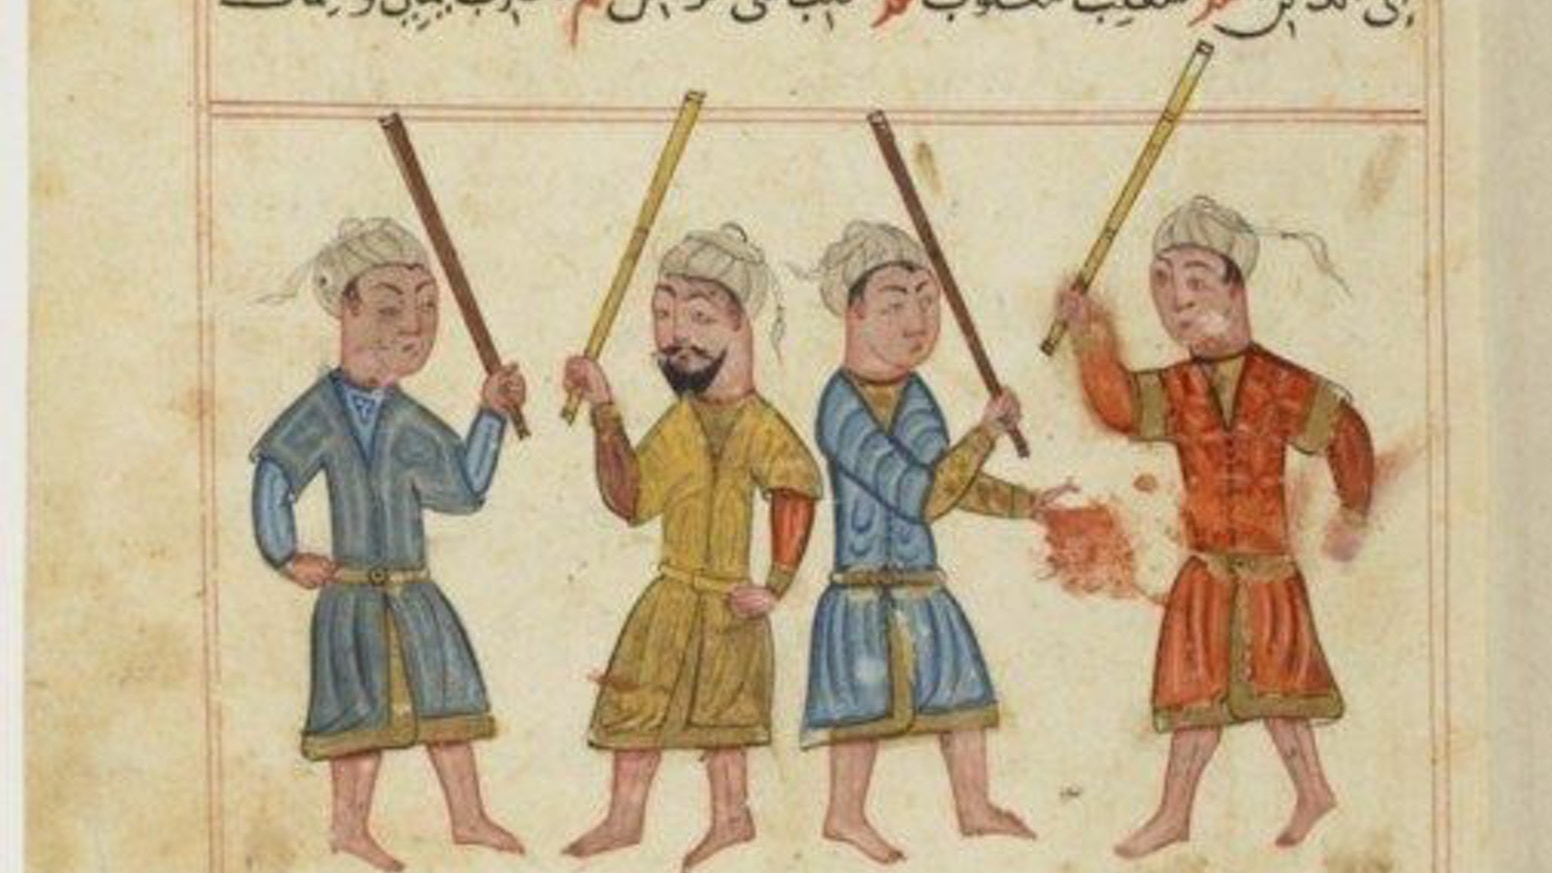 A translation of the of the 1470 Mamluk Treatise Kitāb al-makhzūn jāmiʻ al-funūn (The treasure that combines all arts).